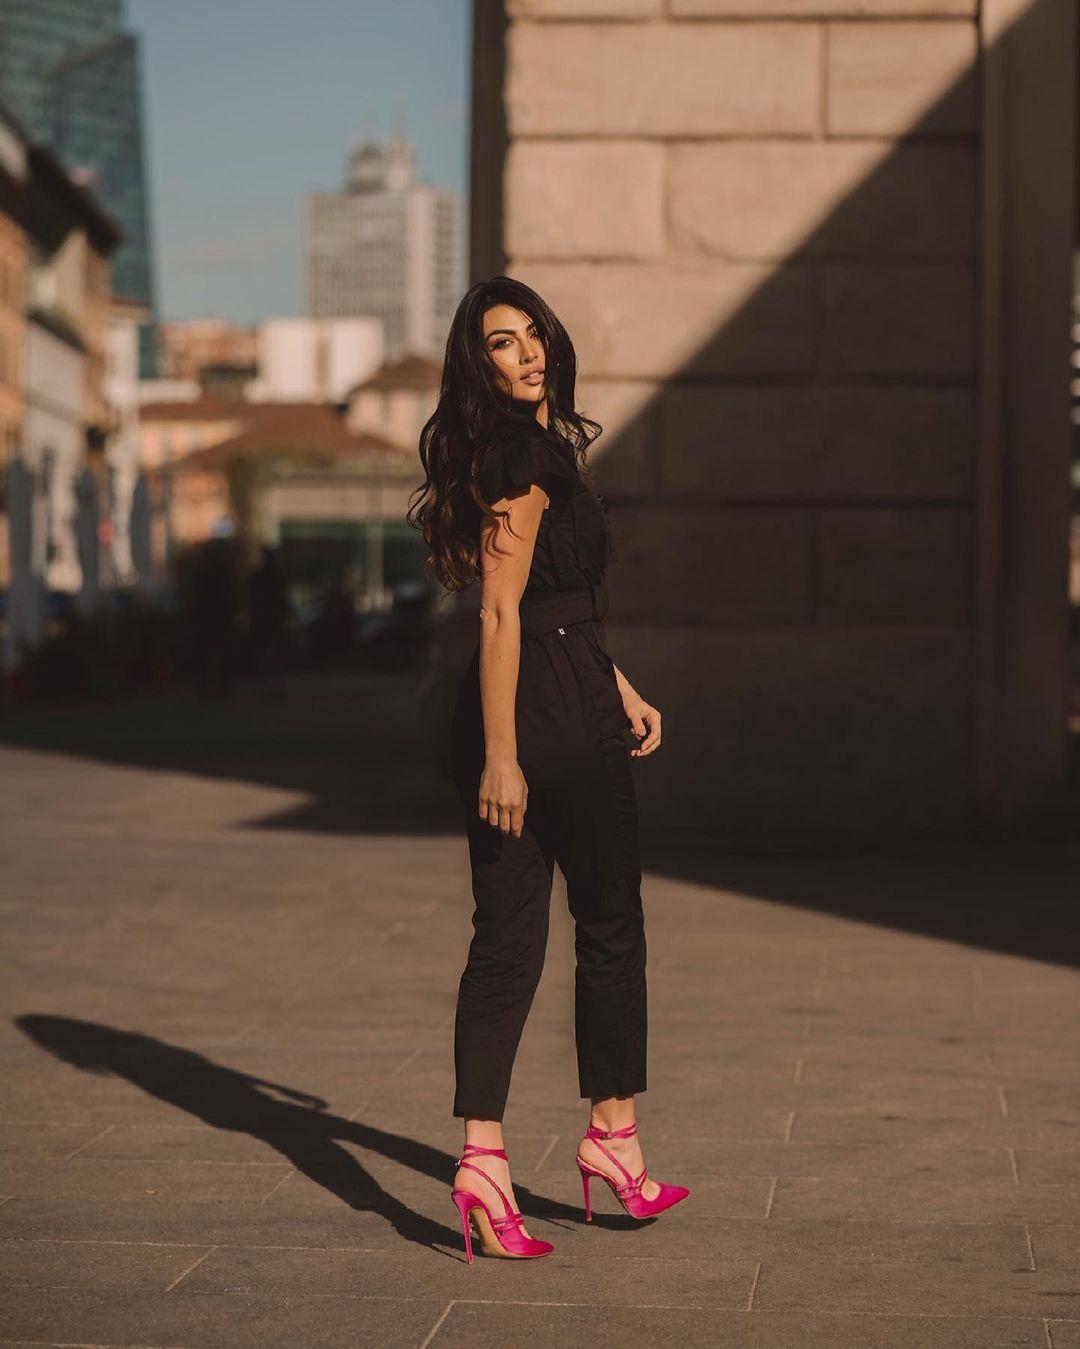 Giulia-Salemi-Wallpapers-Insta-Fit-Bio-3